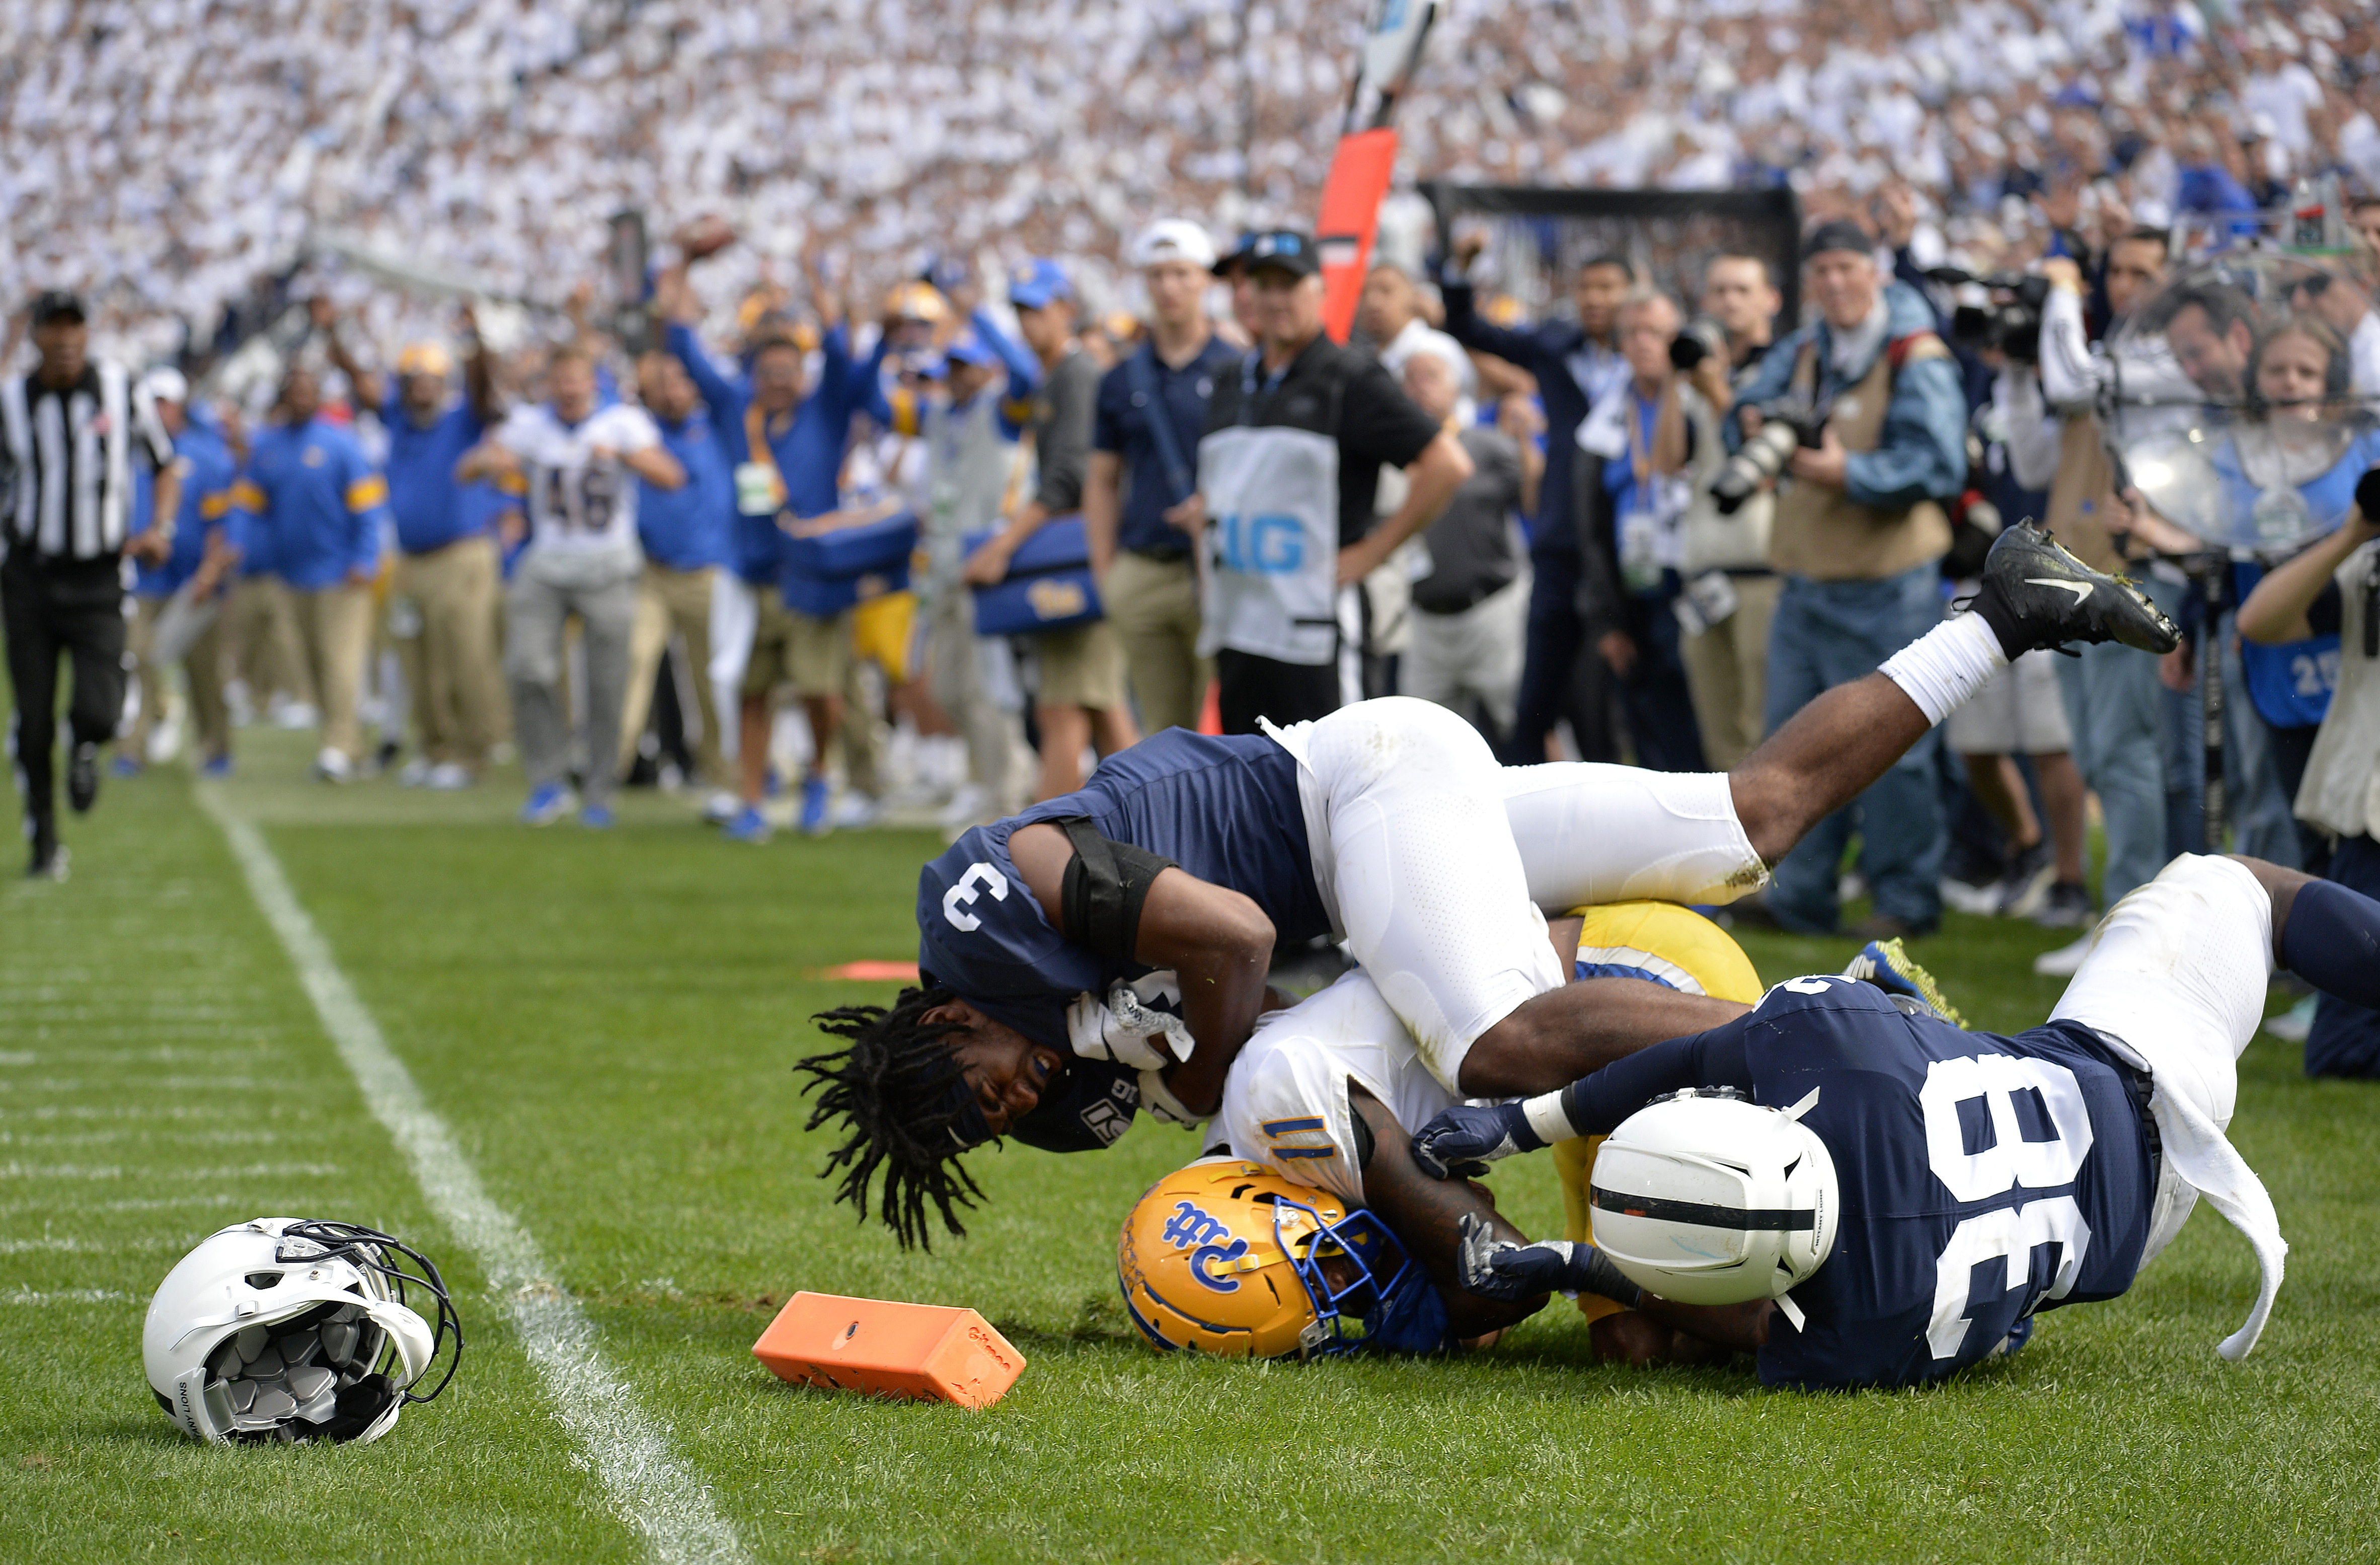 COLLEGE FOOTBALL: SEP 14 Pitt at Penn State